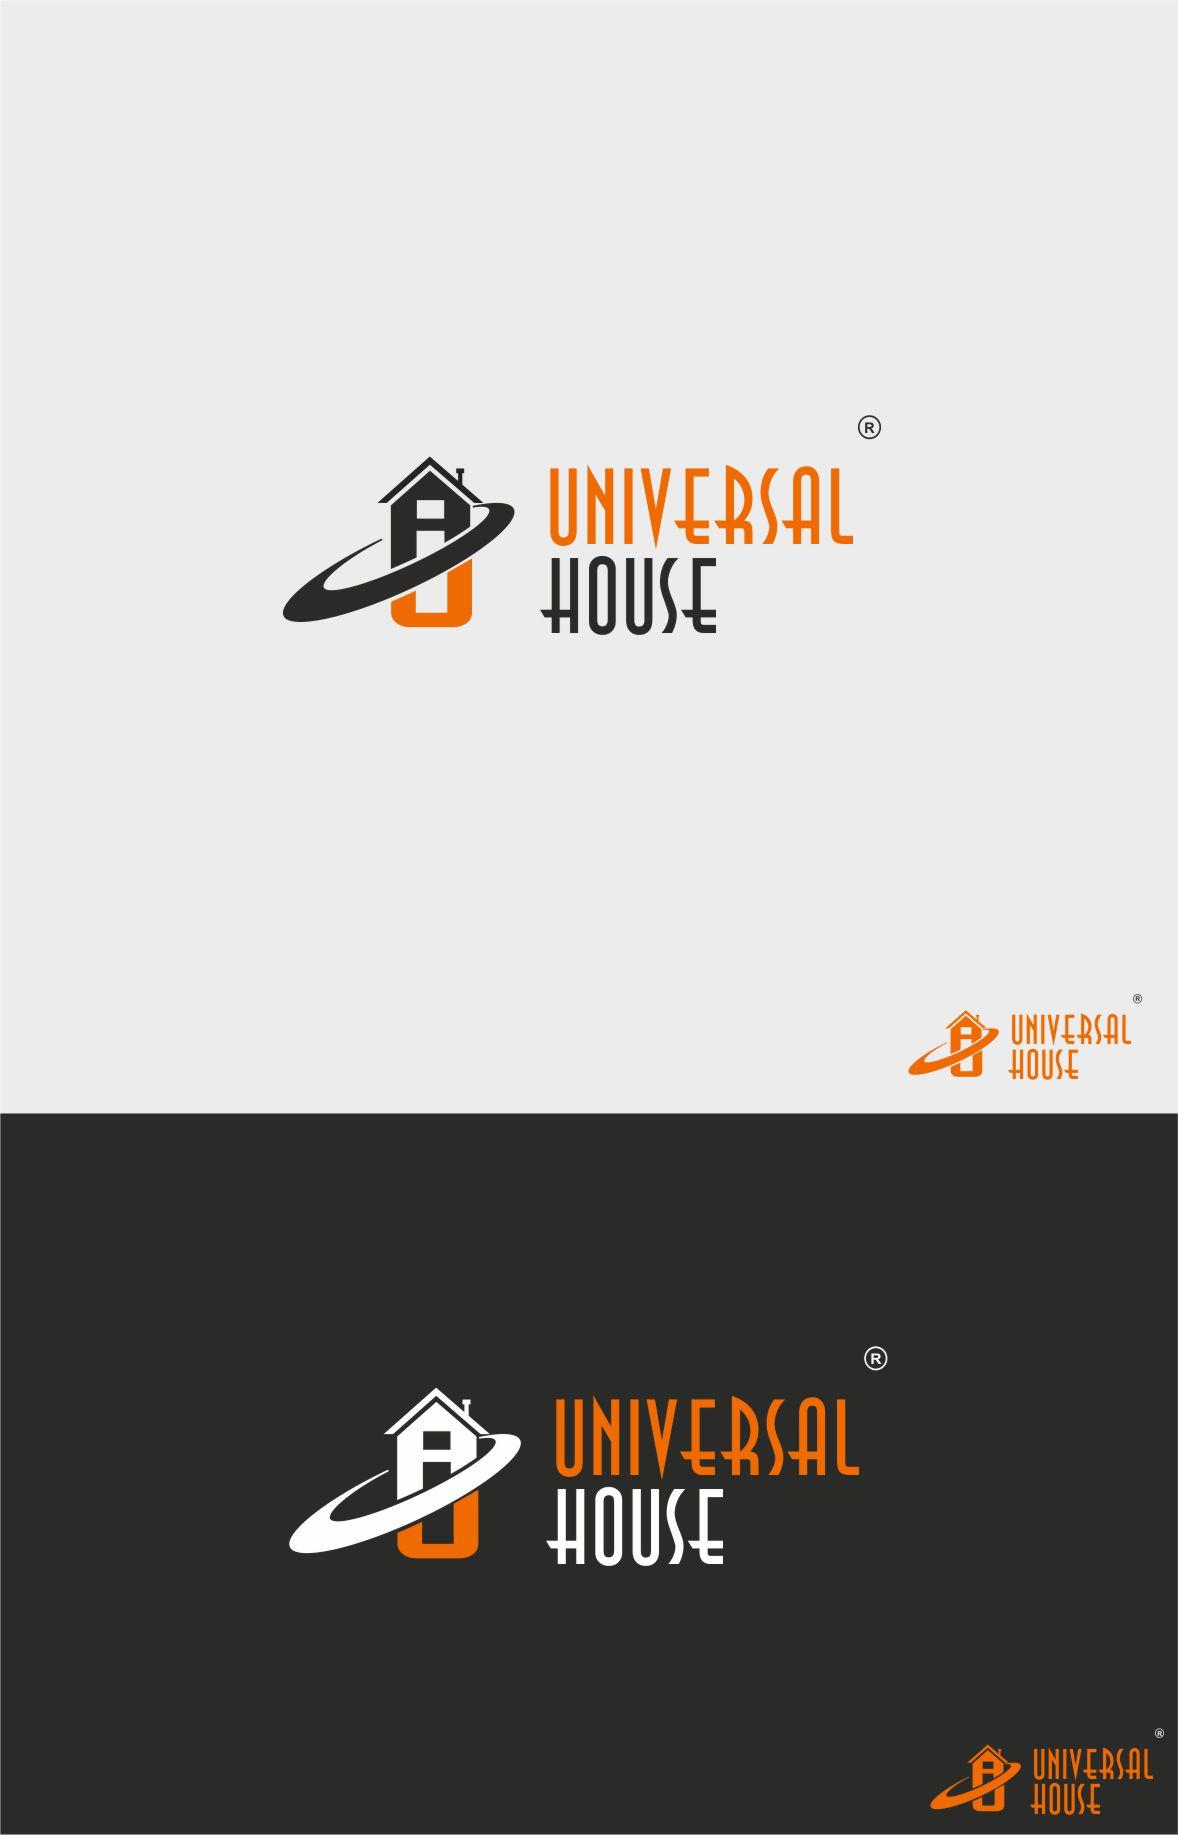 Создаем Лого для Интерьер портала фото f_89451497abedb18d.jpg